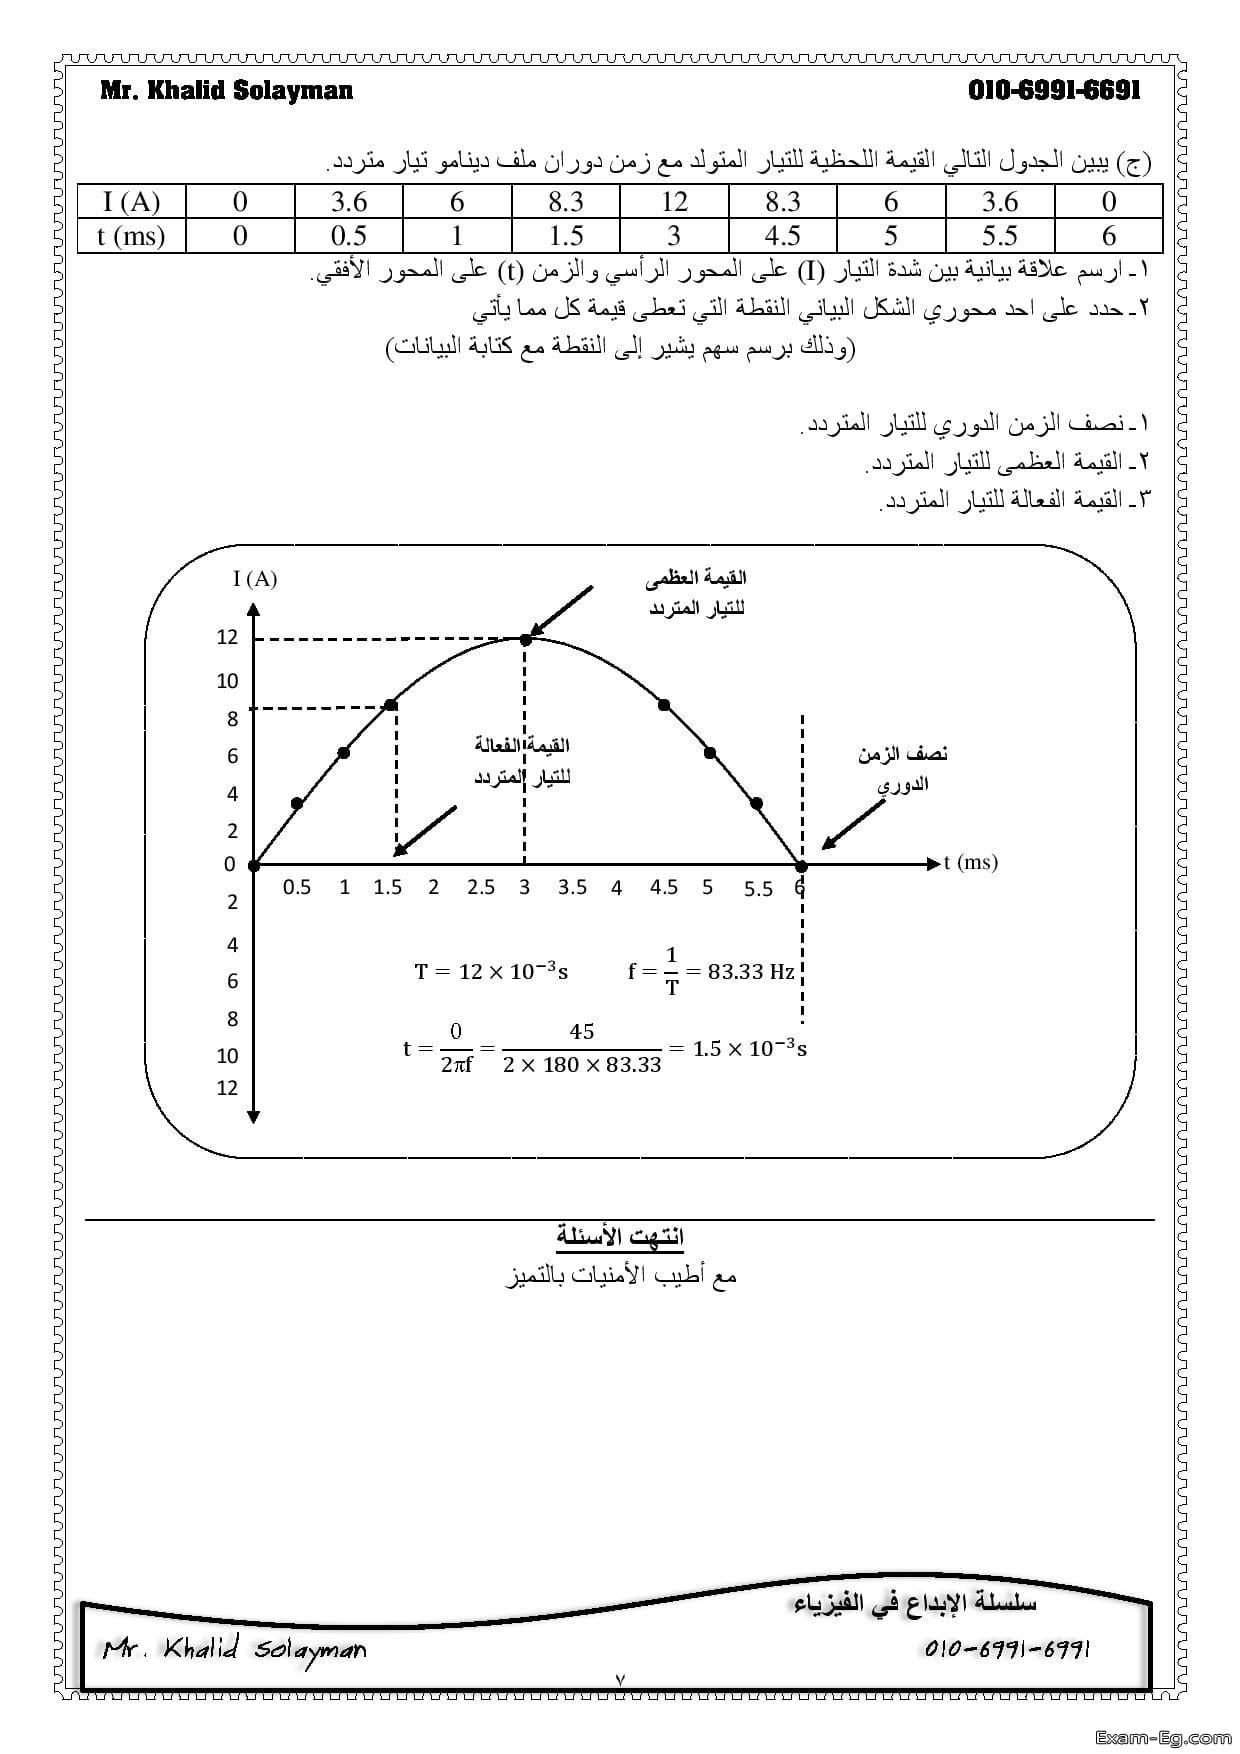 exam-eg.com_15564705687237.jpg